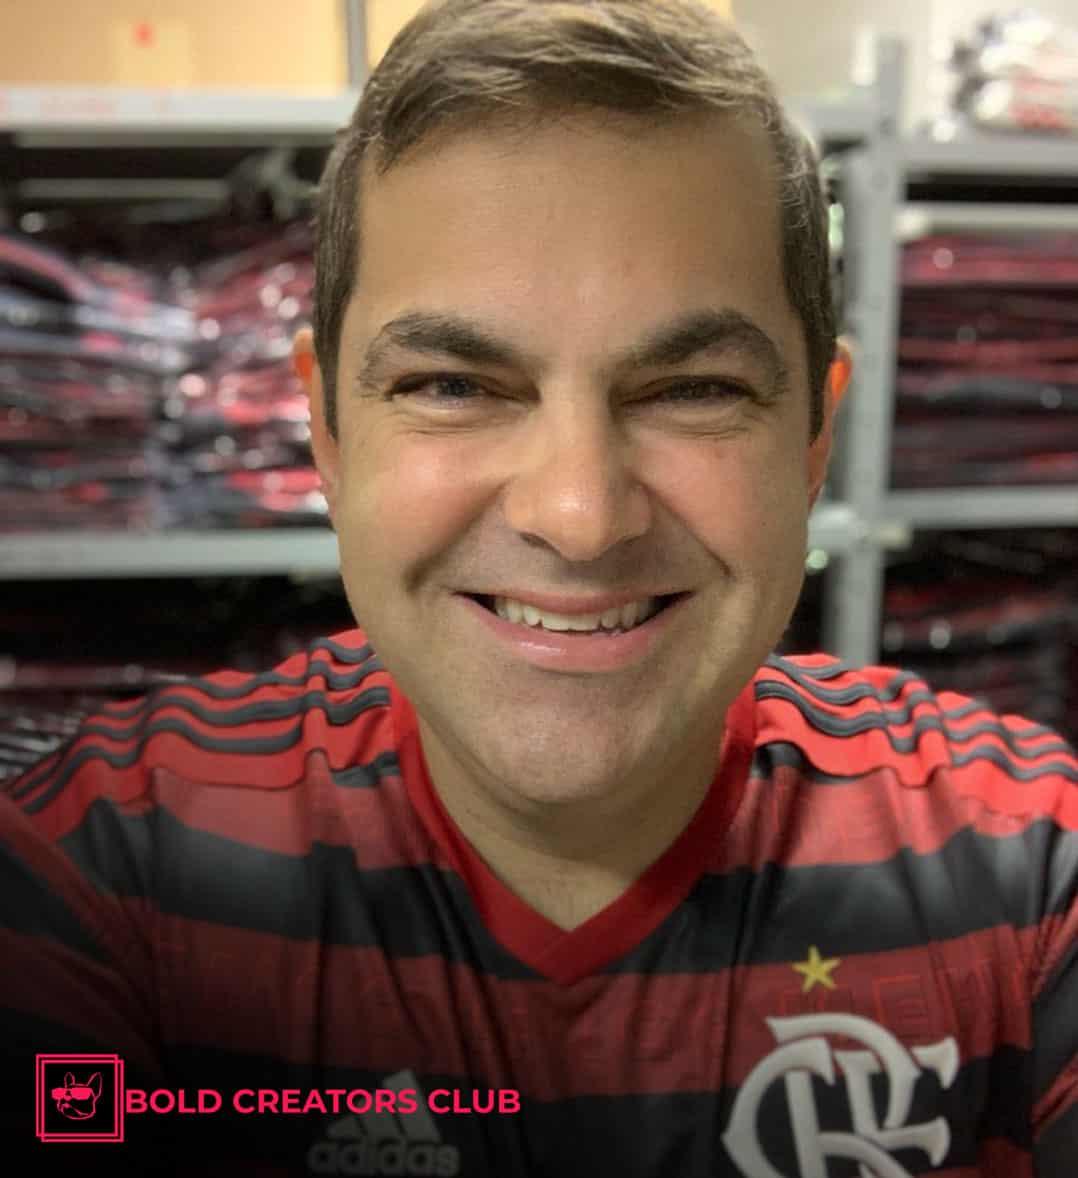 Paparazzo Bold Creators Club Influencer Marketing Agency South America Brazil